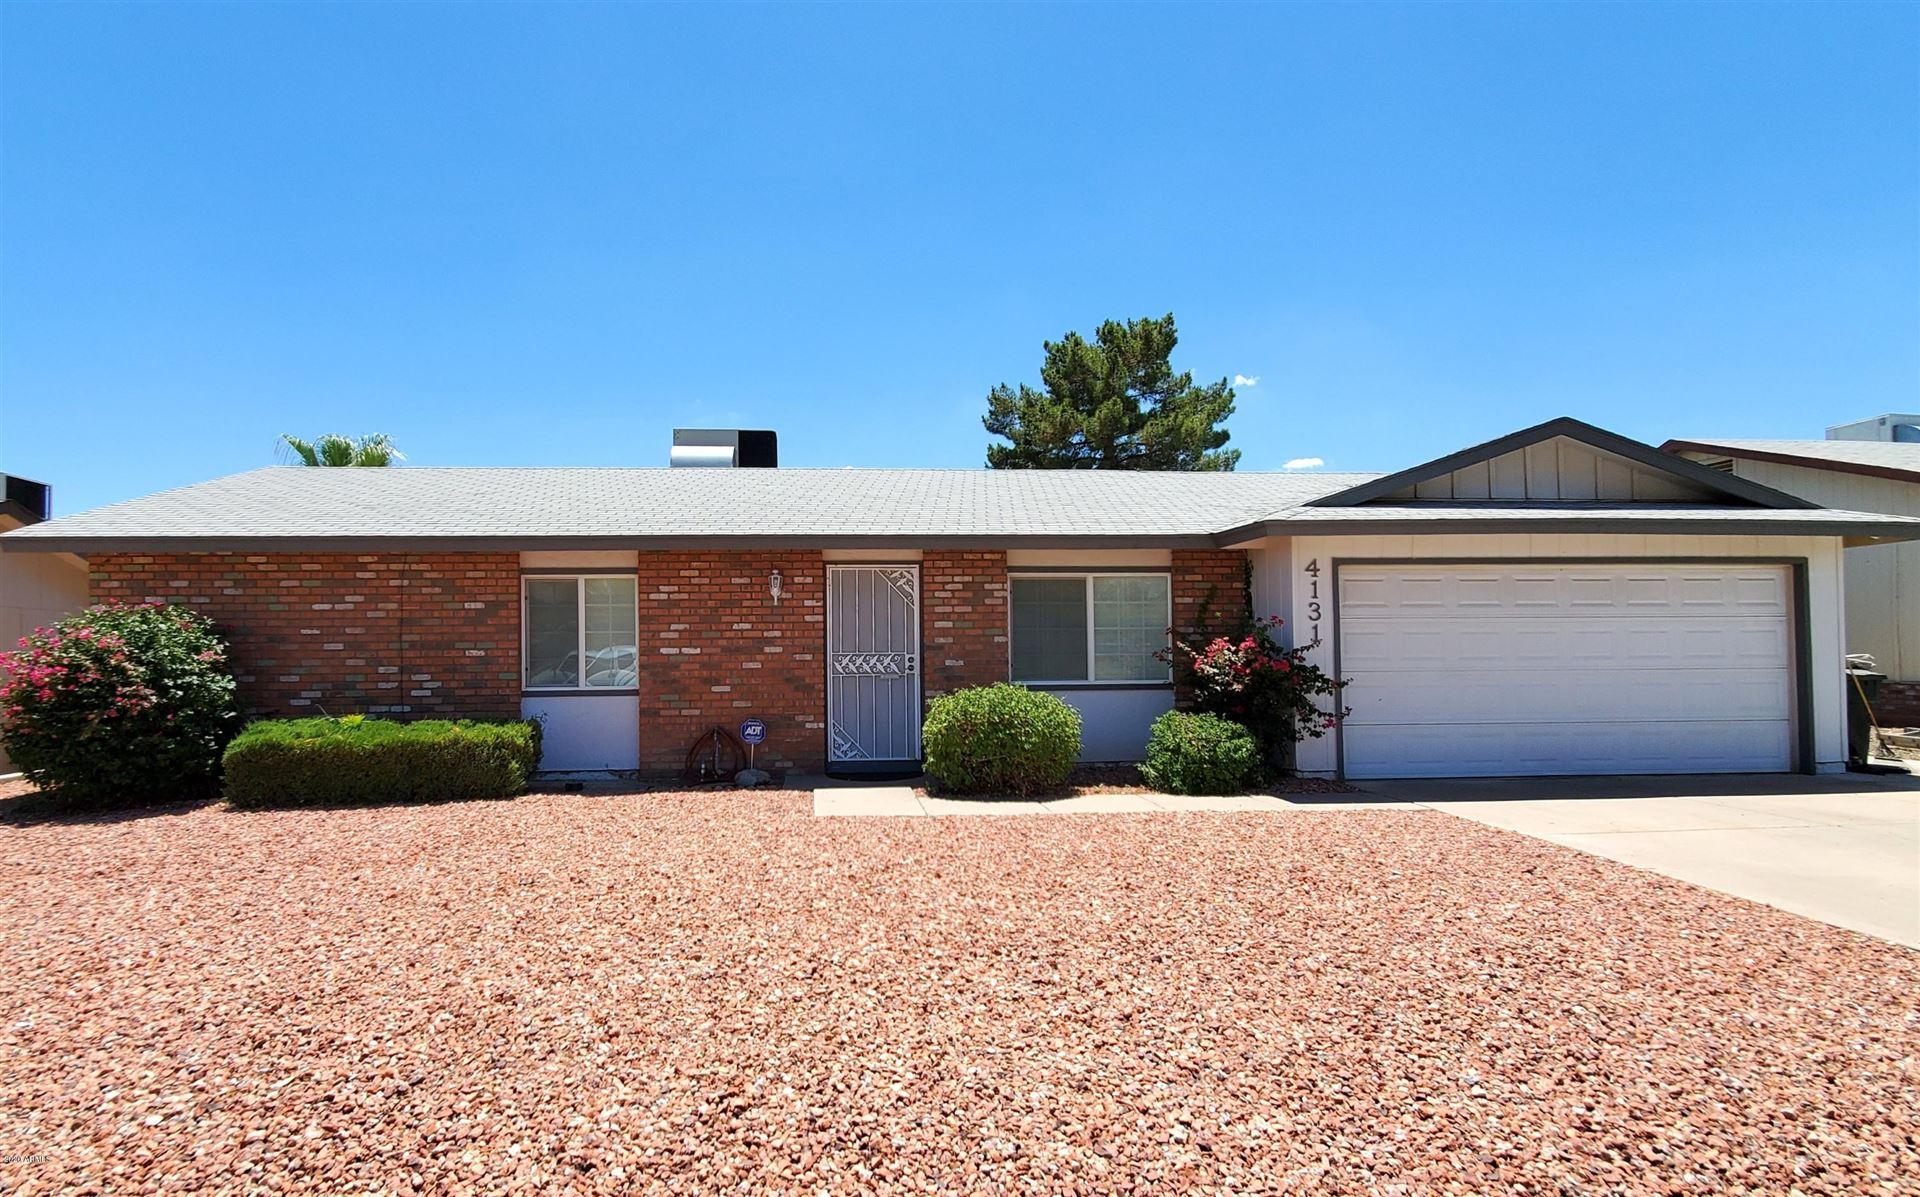 Photo of 4131 E WALATOWA Street, Phoenix, AZ 85044 (MLS # 6201370)